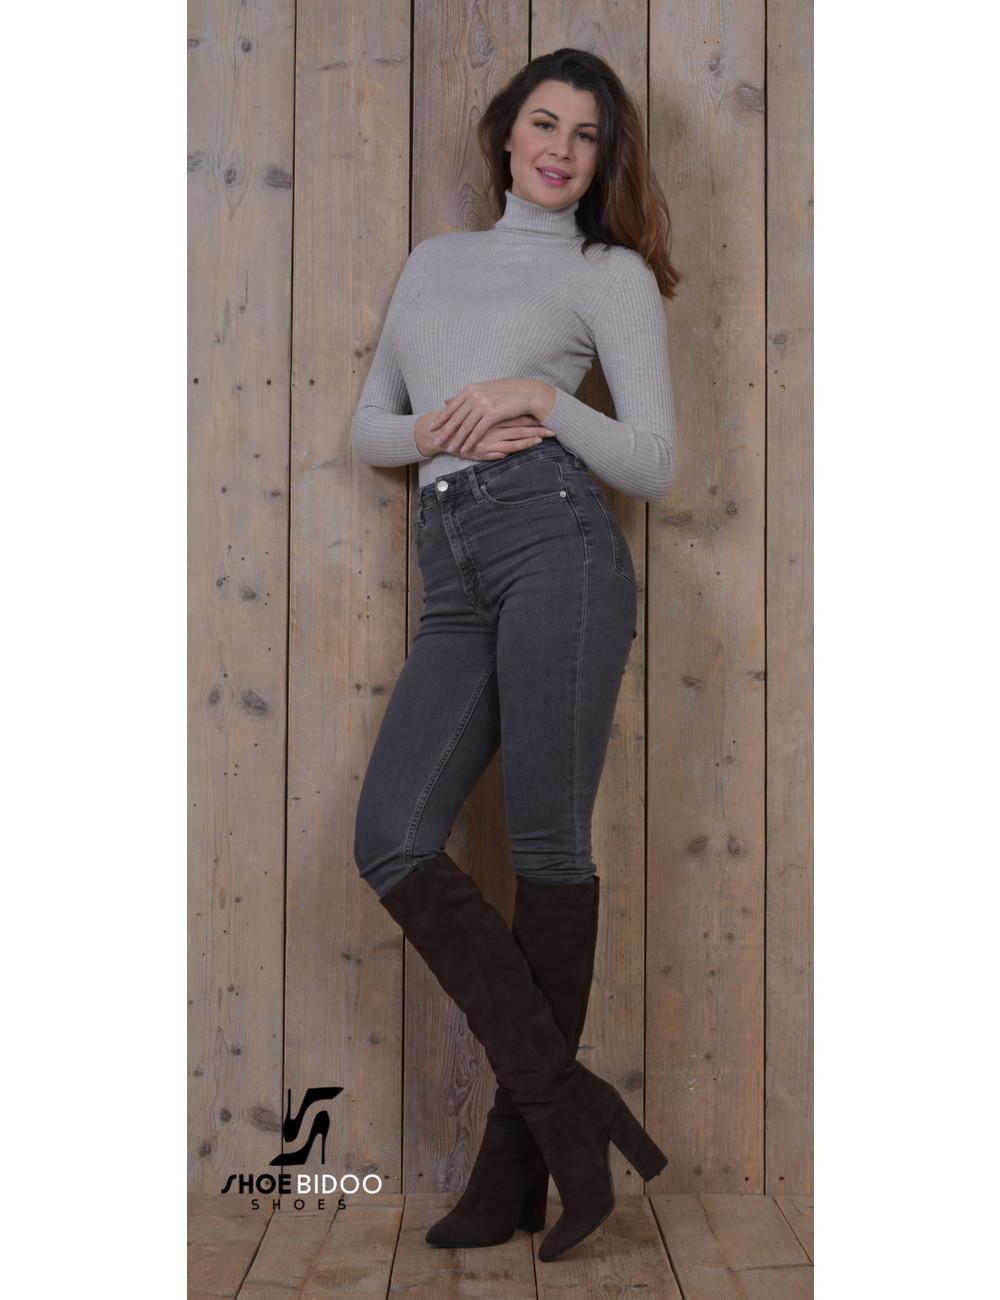 Sanctum Shoes Olga in Italian leather knee boots